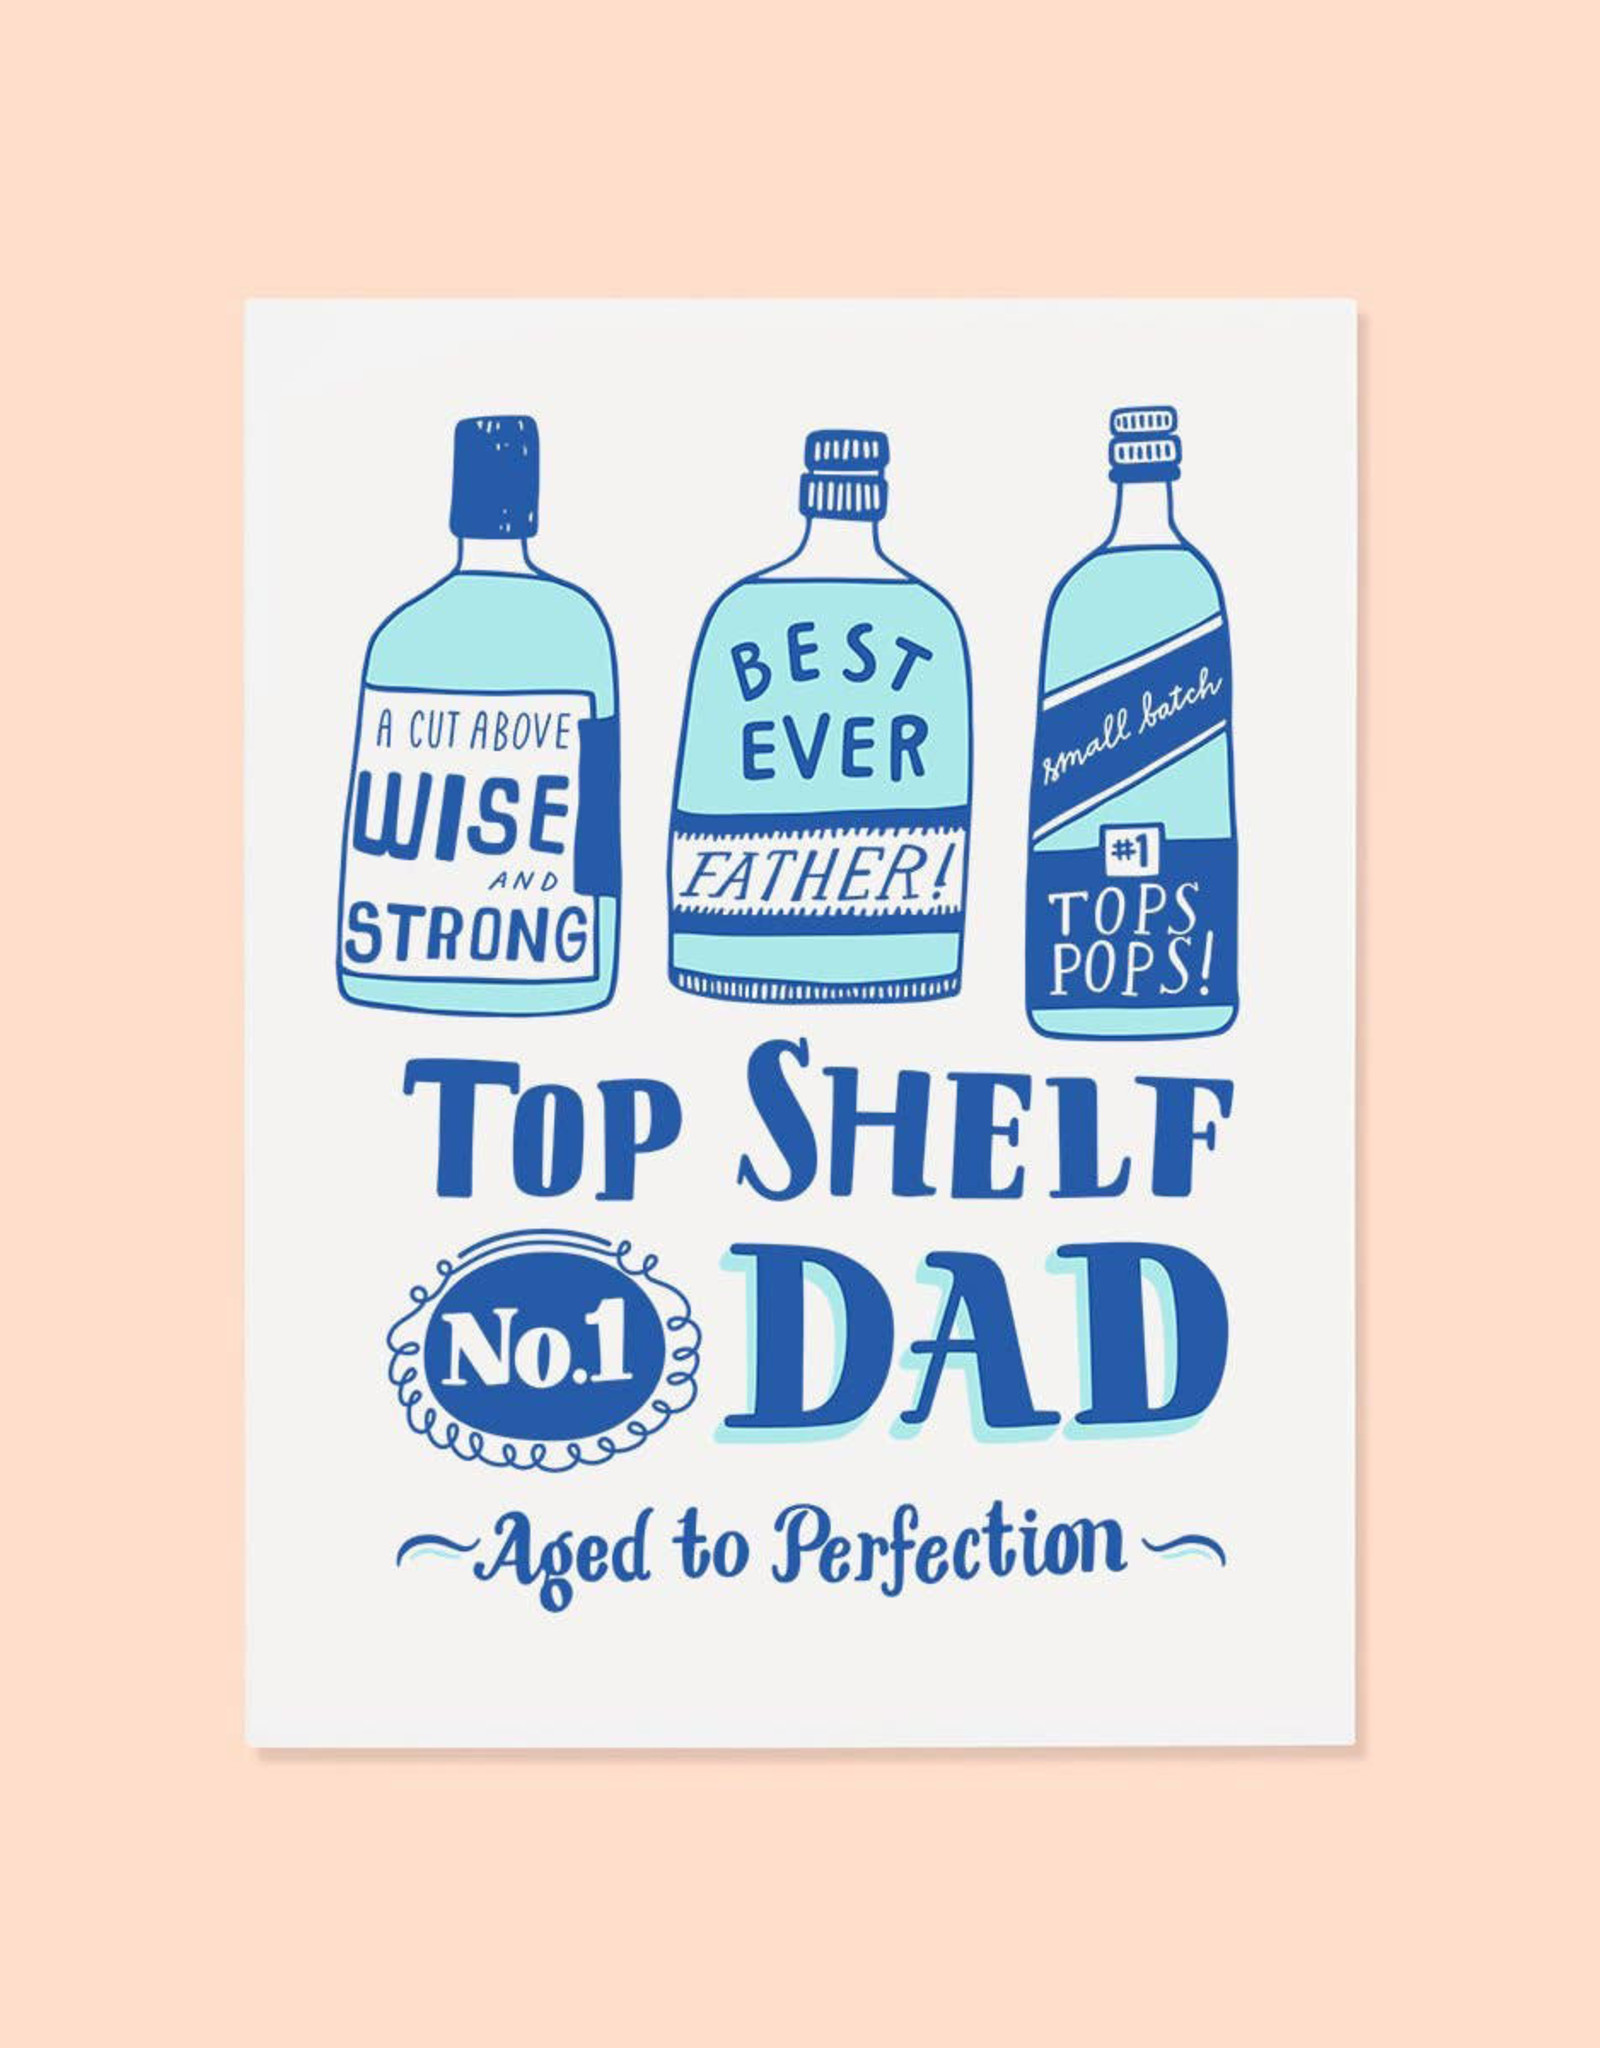 The Good Twin Top Shelf Card